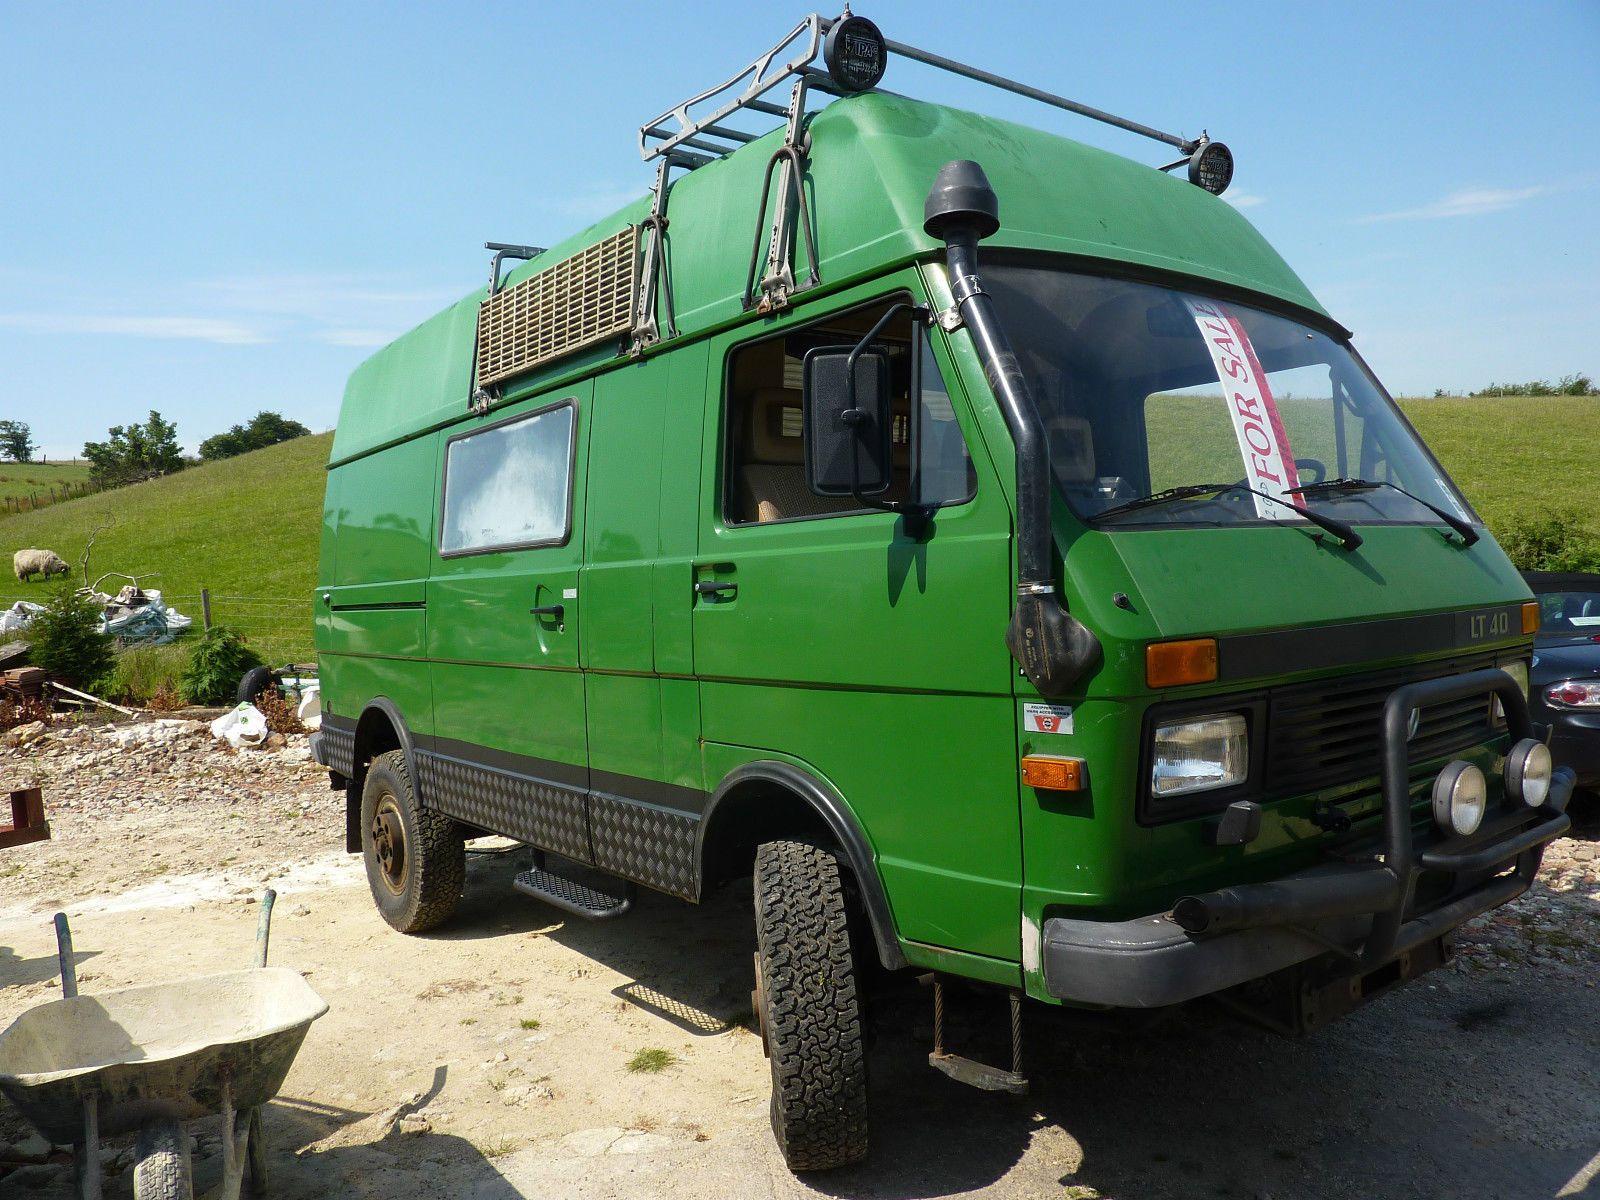 Vw Lt40 4x4 Camper автомобили кэмперы Vw 4x4 4x4 Van